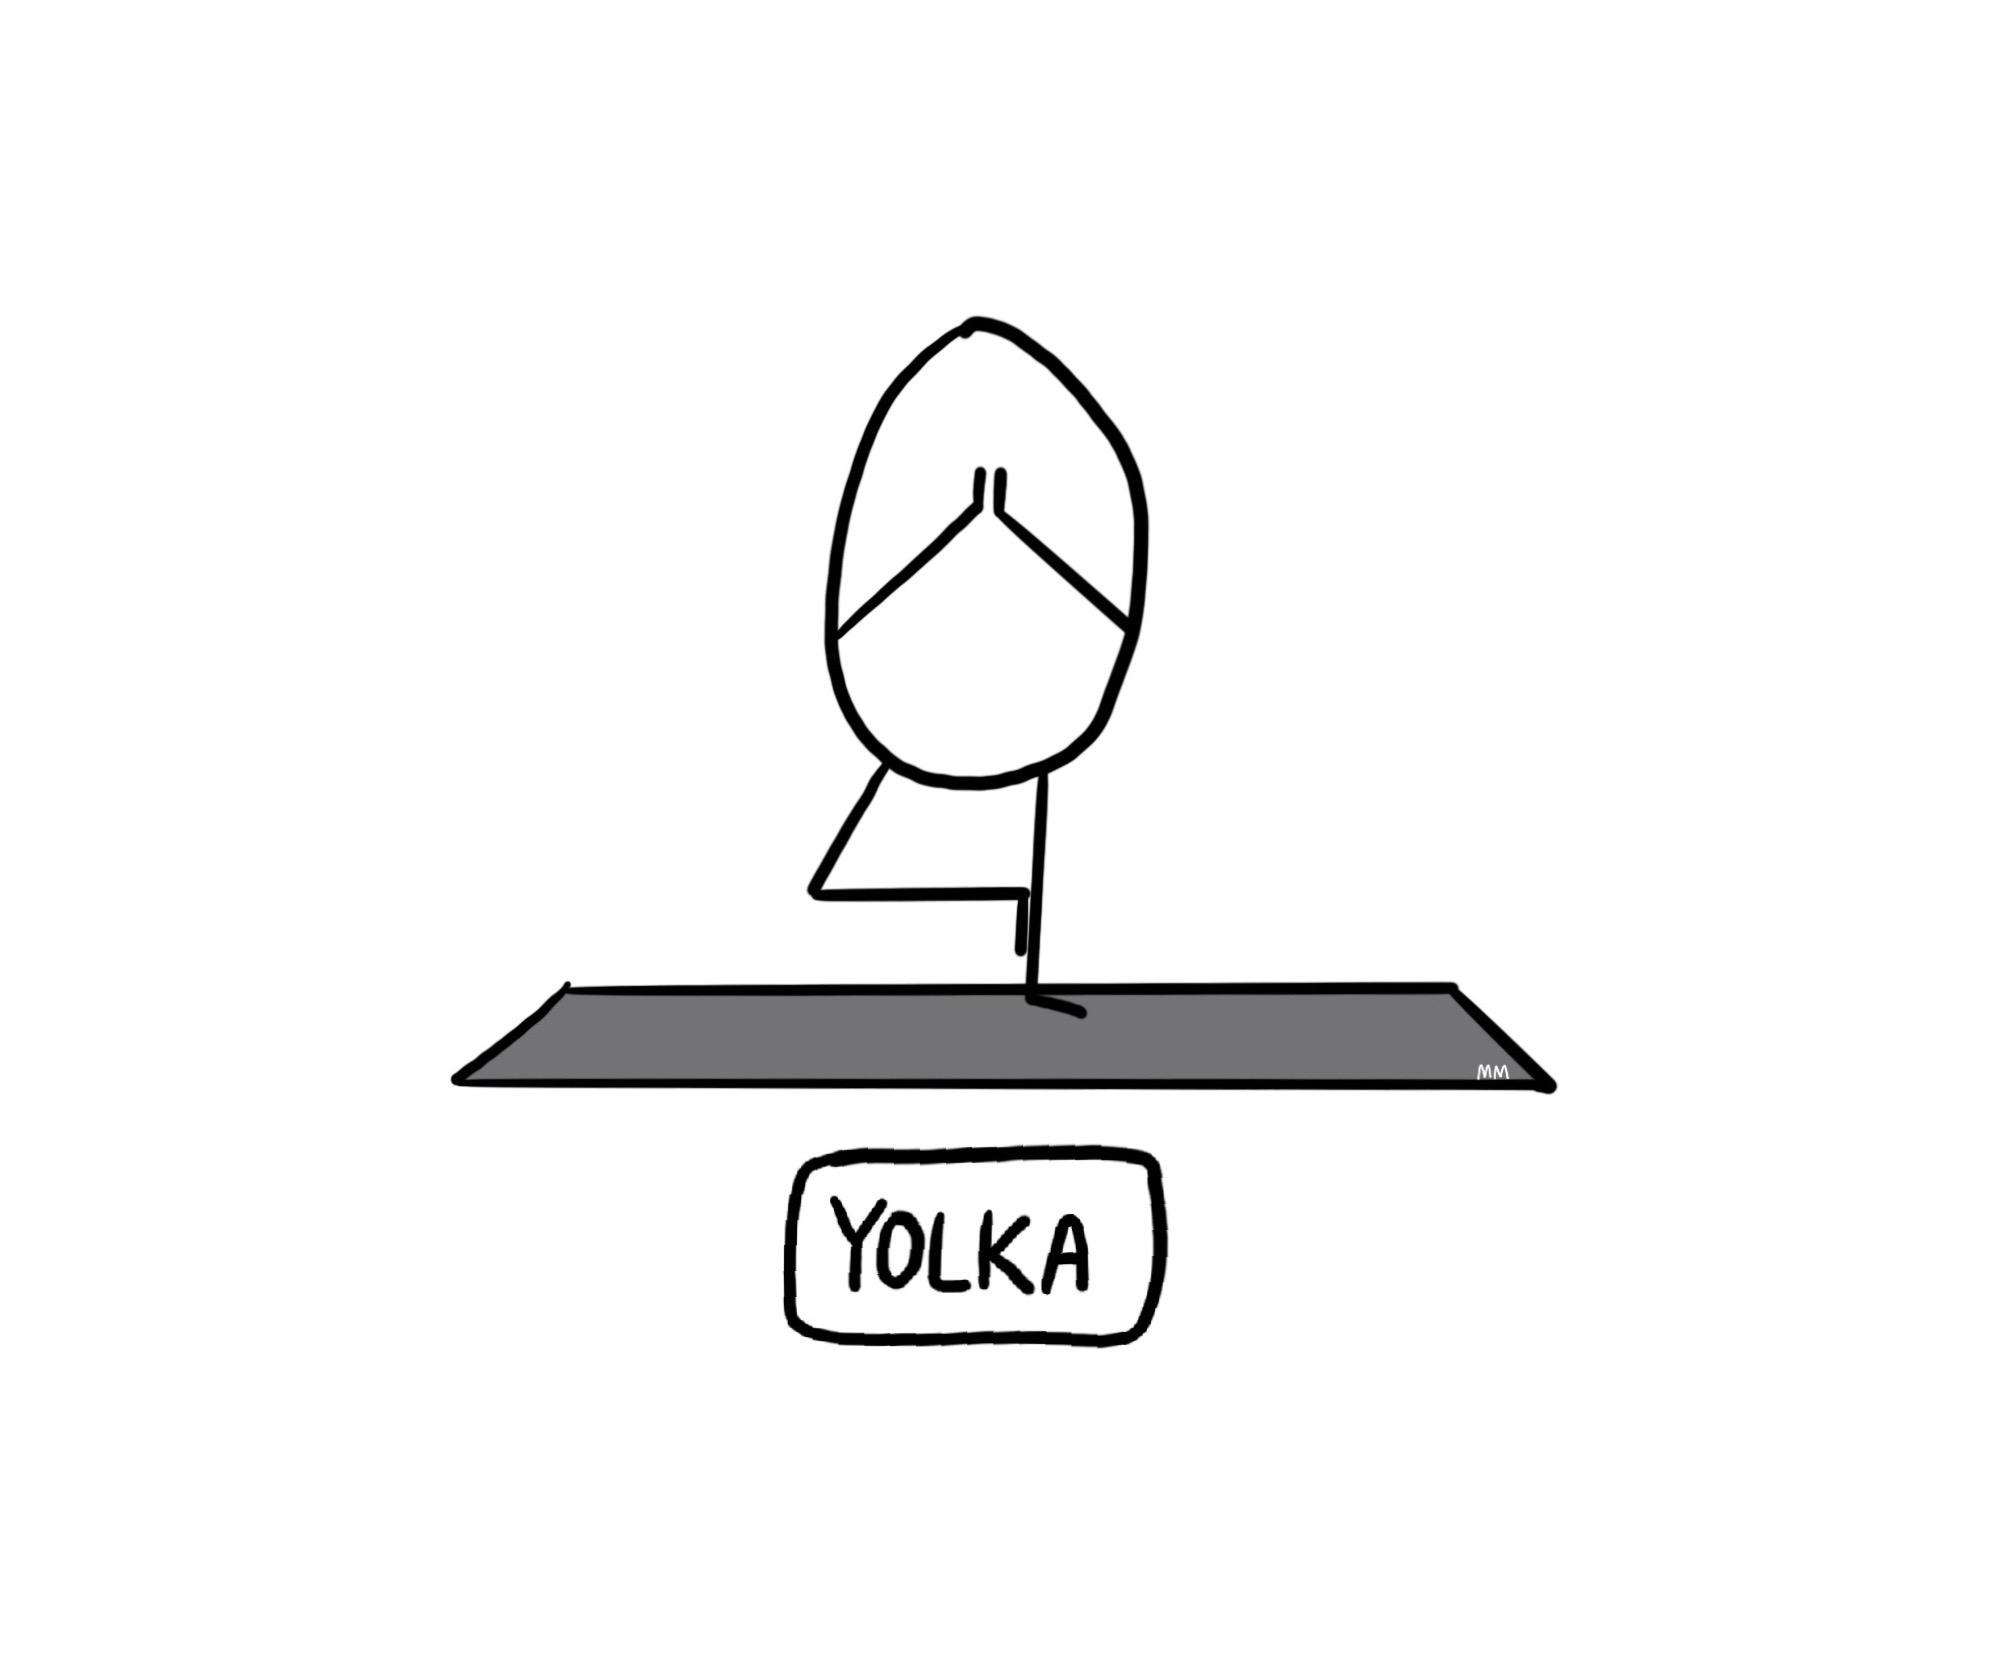 Yolka